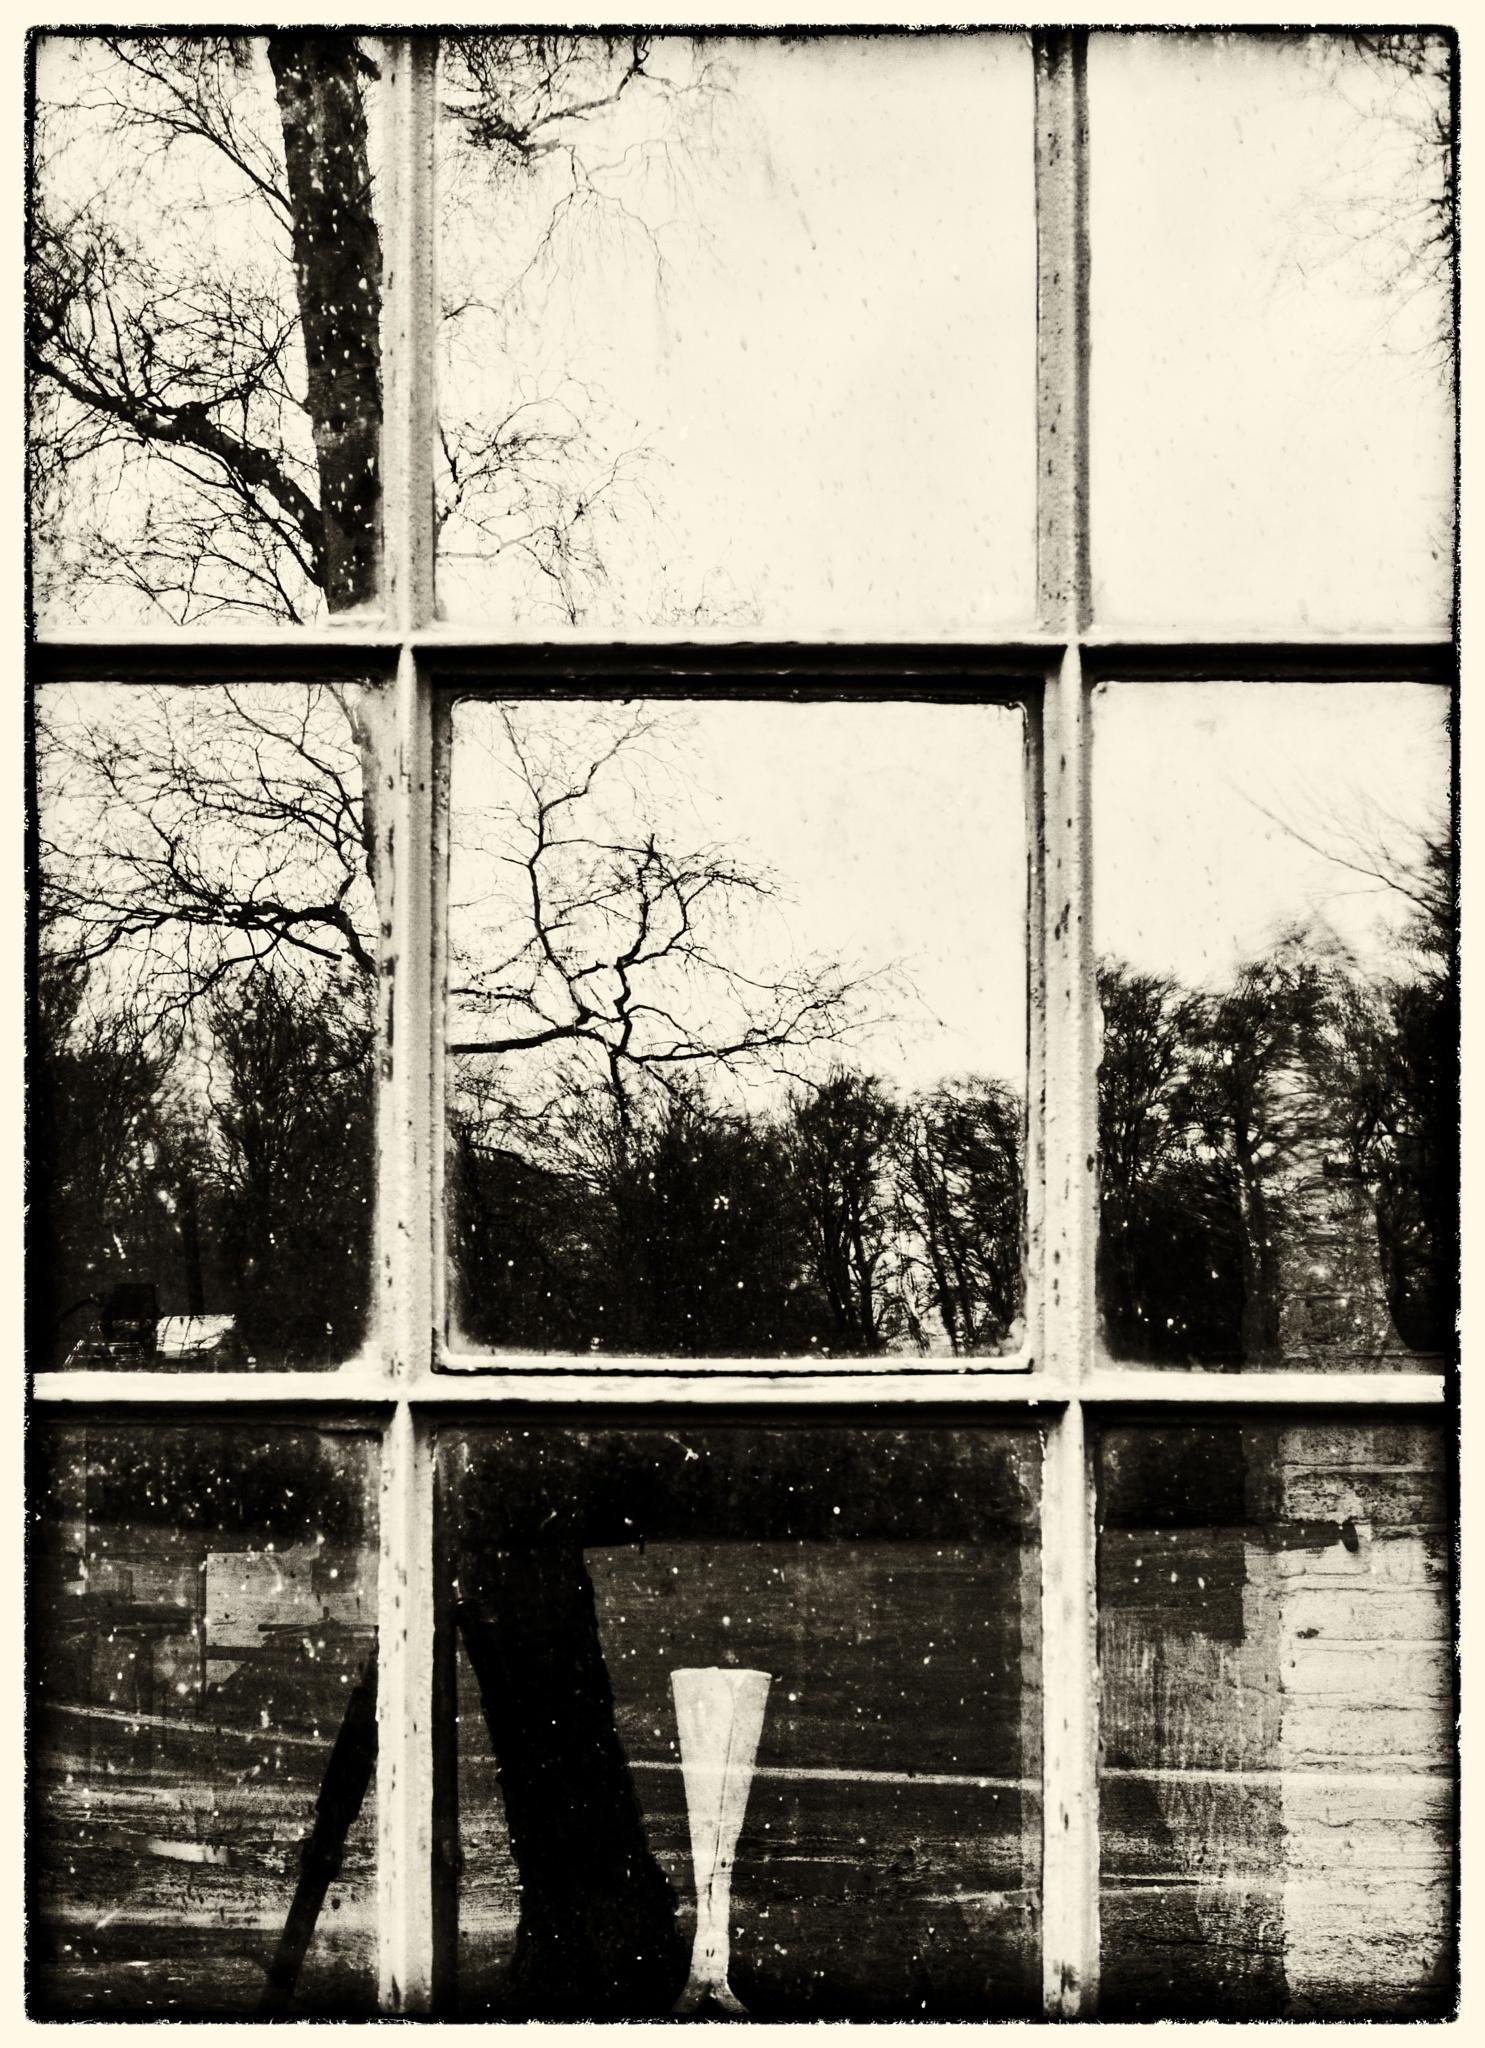 Mirror? by Leif Heering